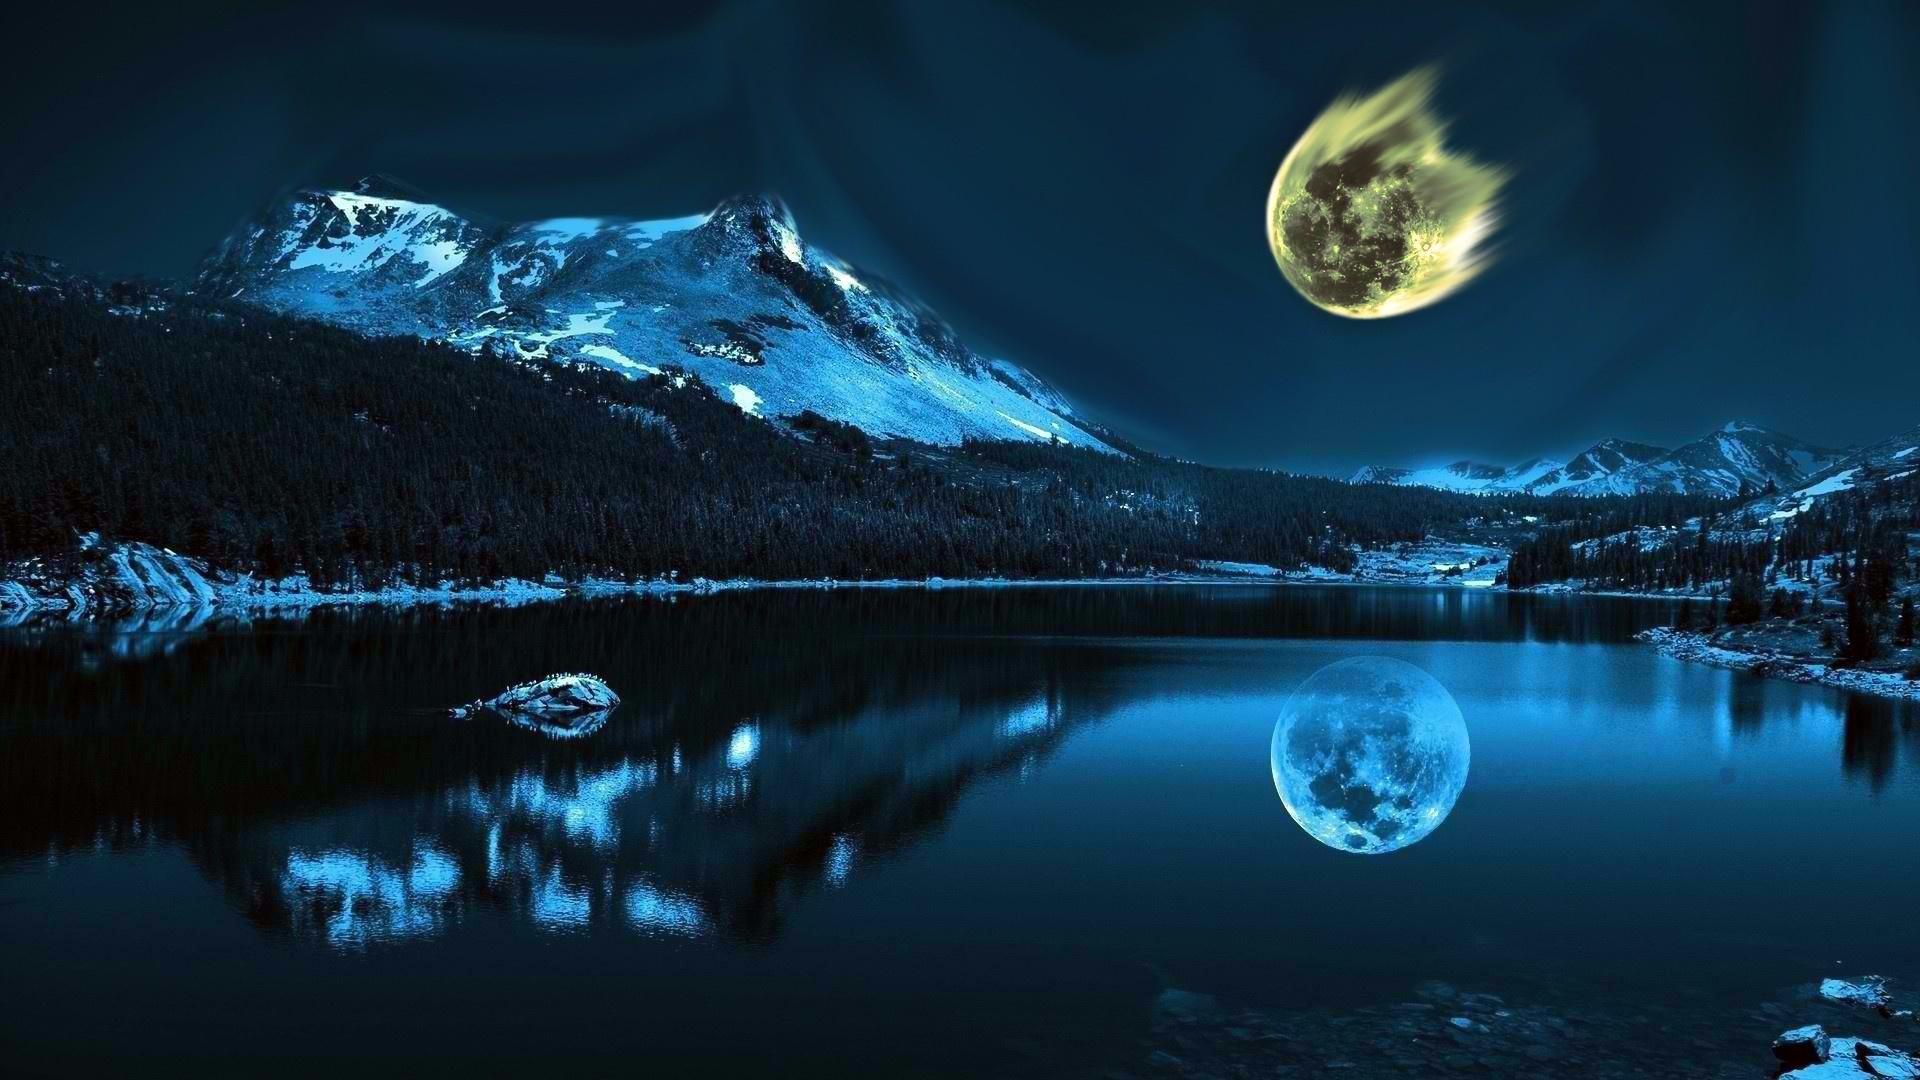 Night Download Wallpaper